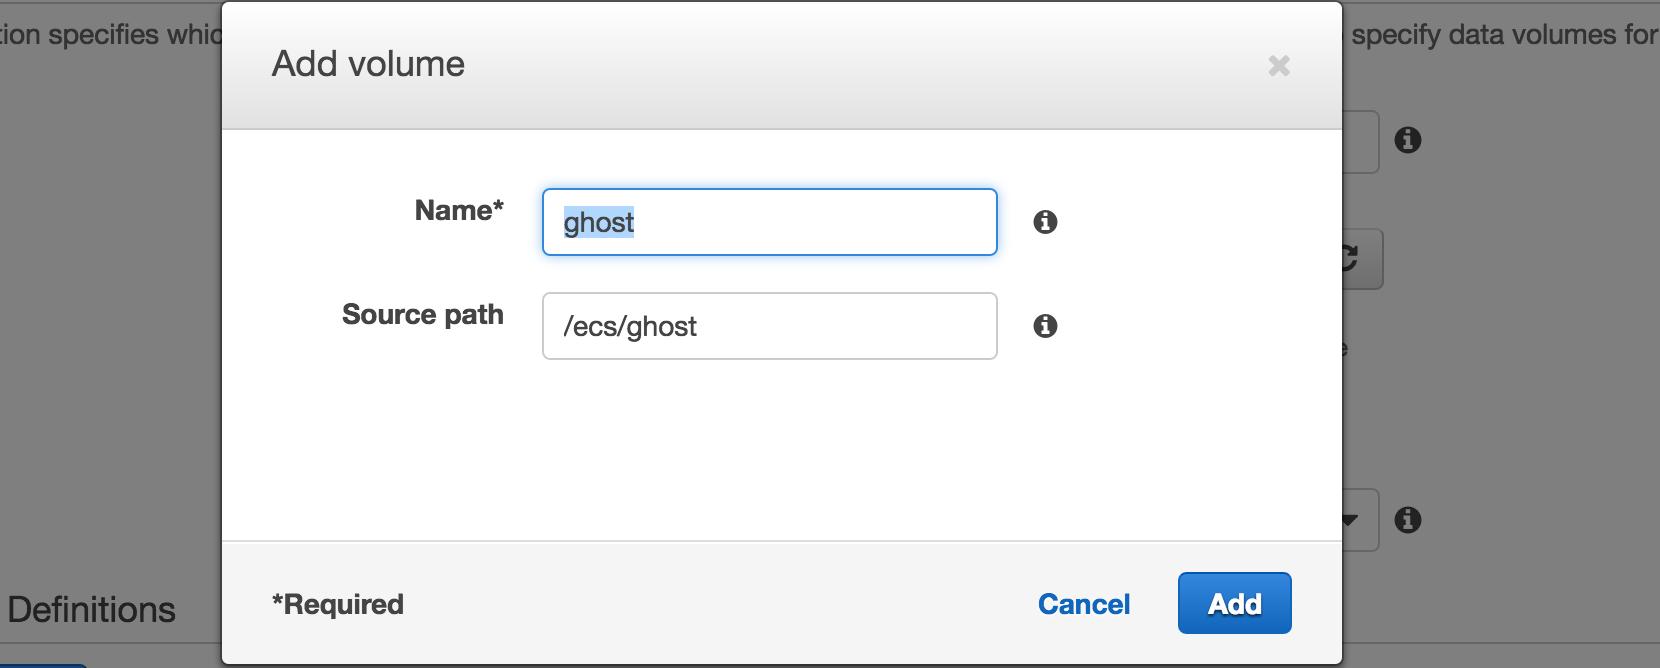 Ghost volume